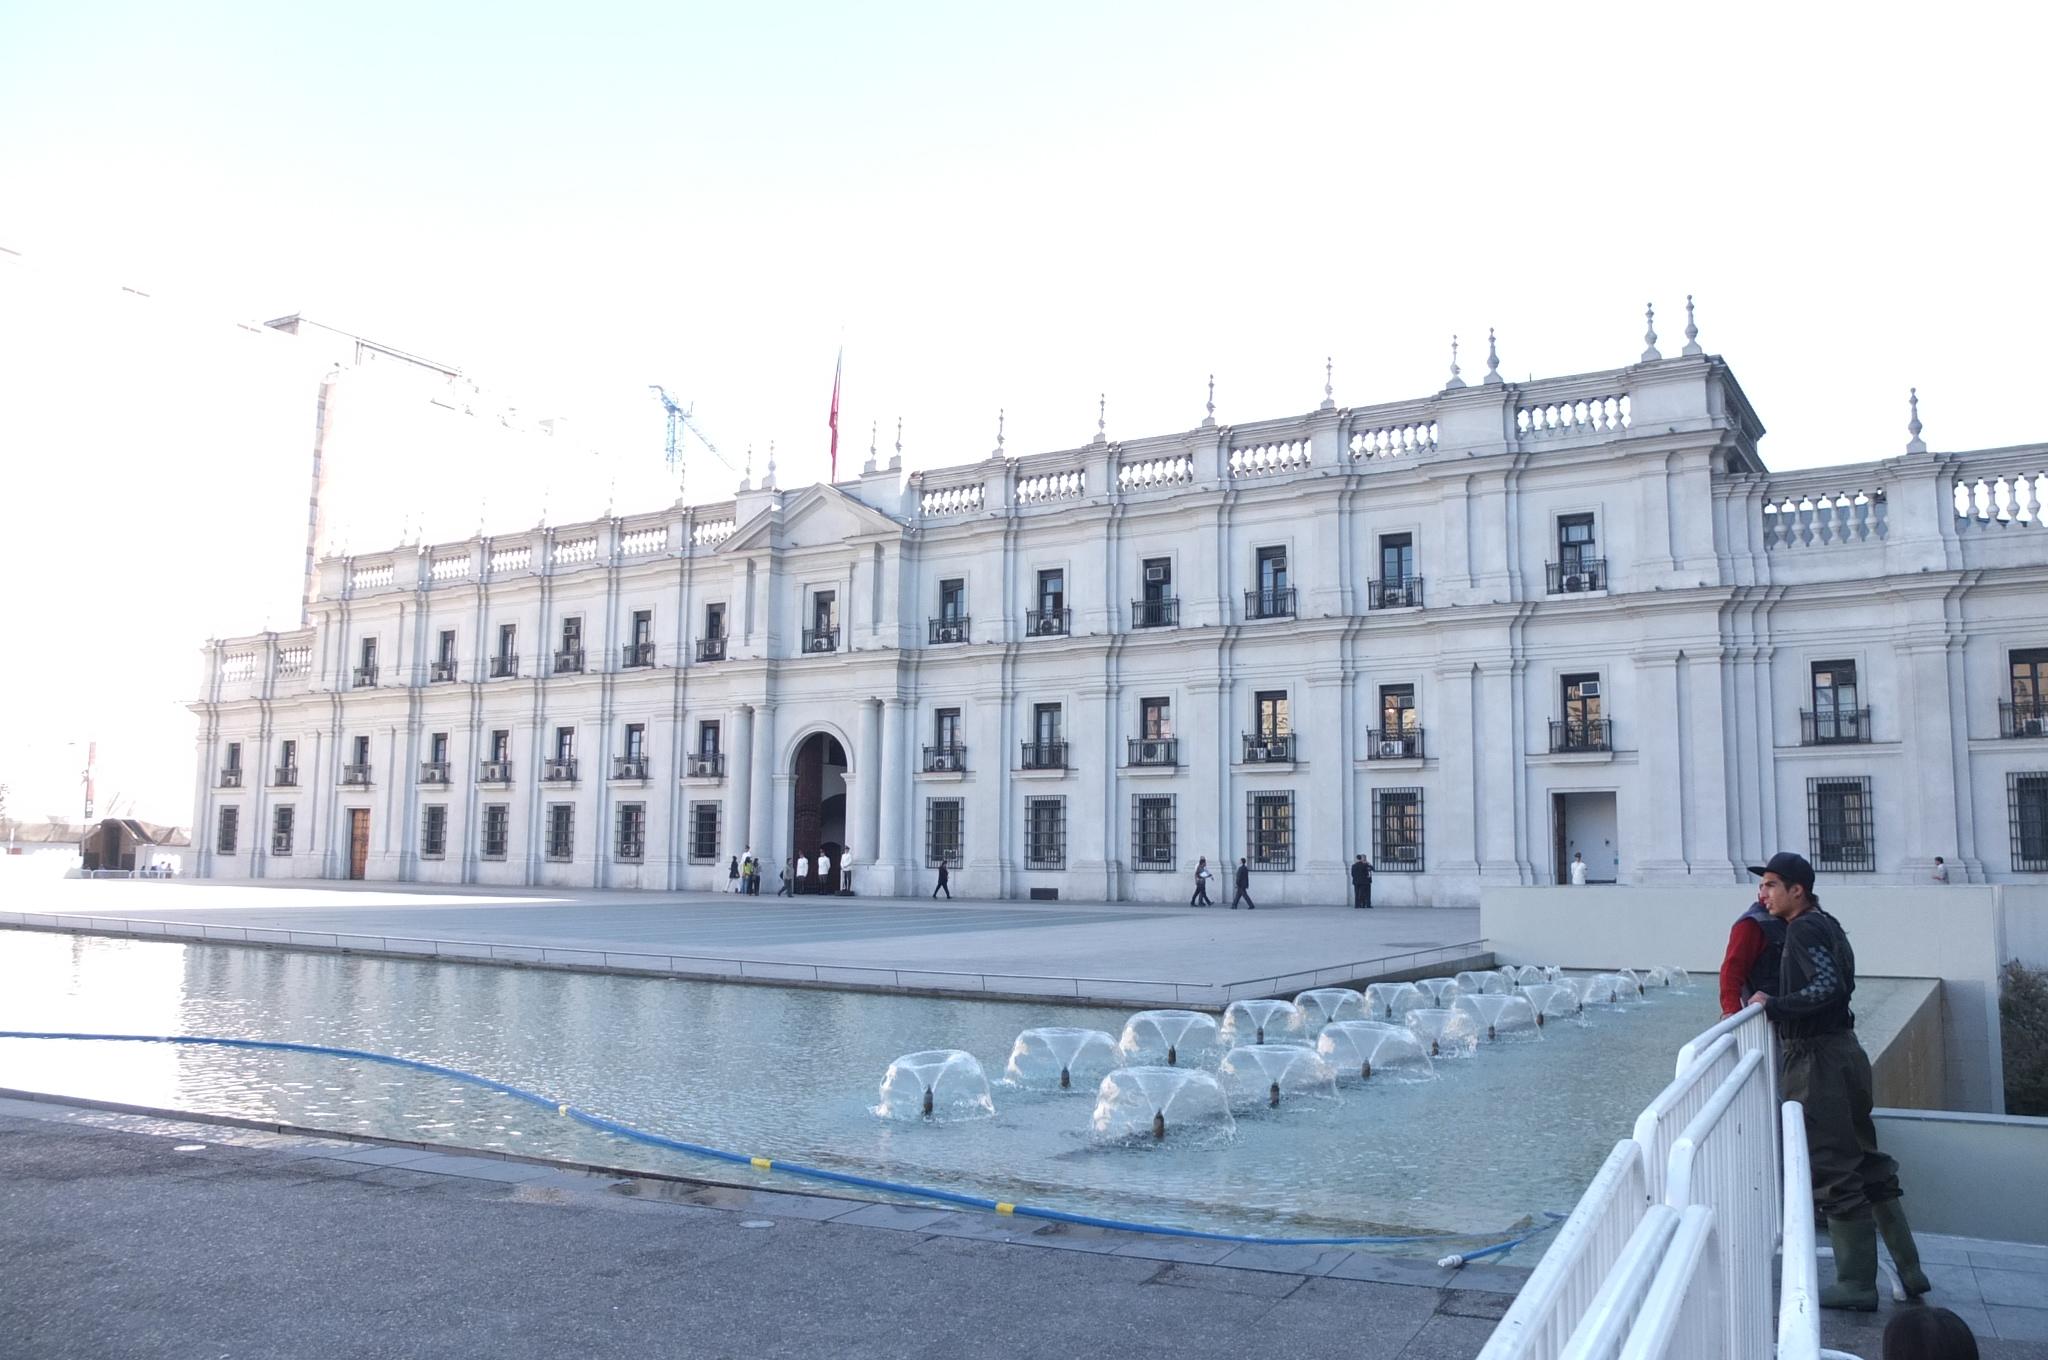 Santiago Chile(President Palace)